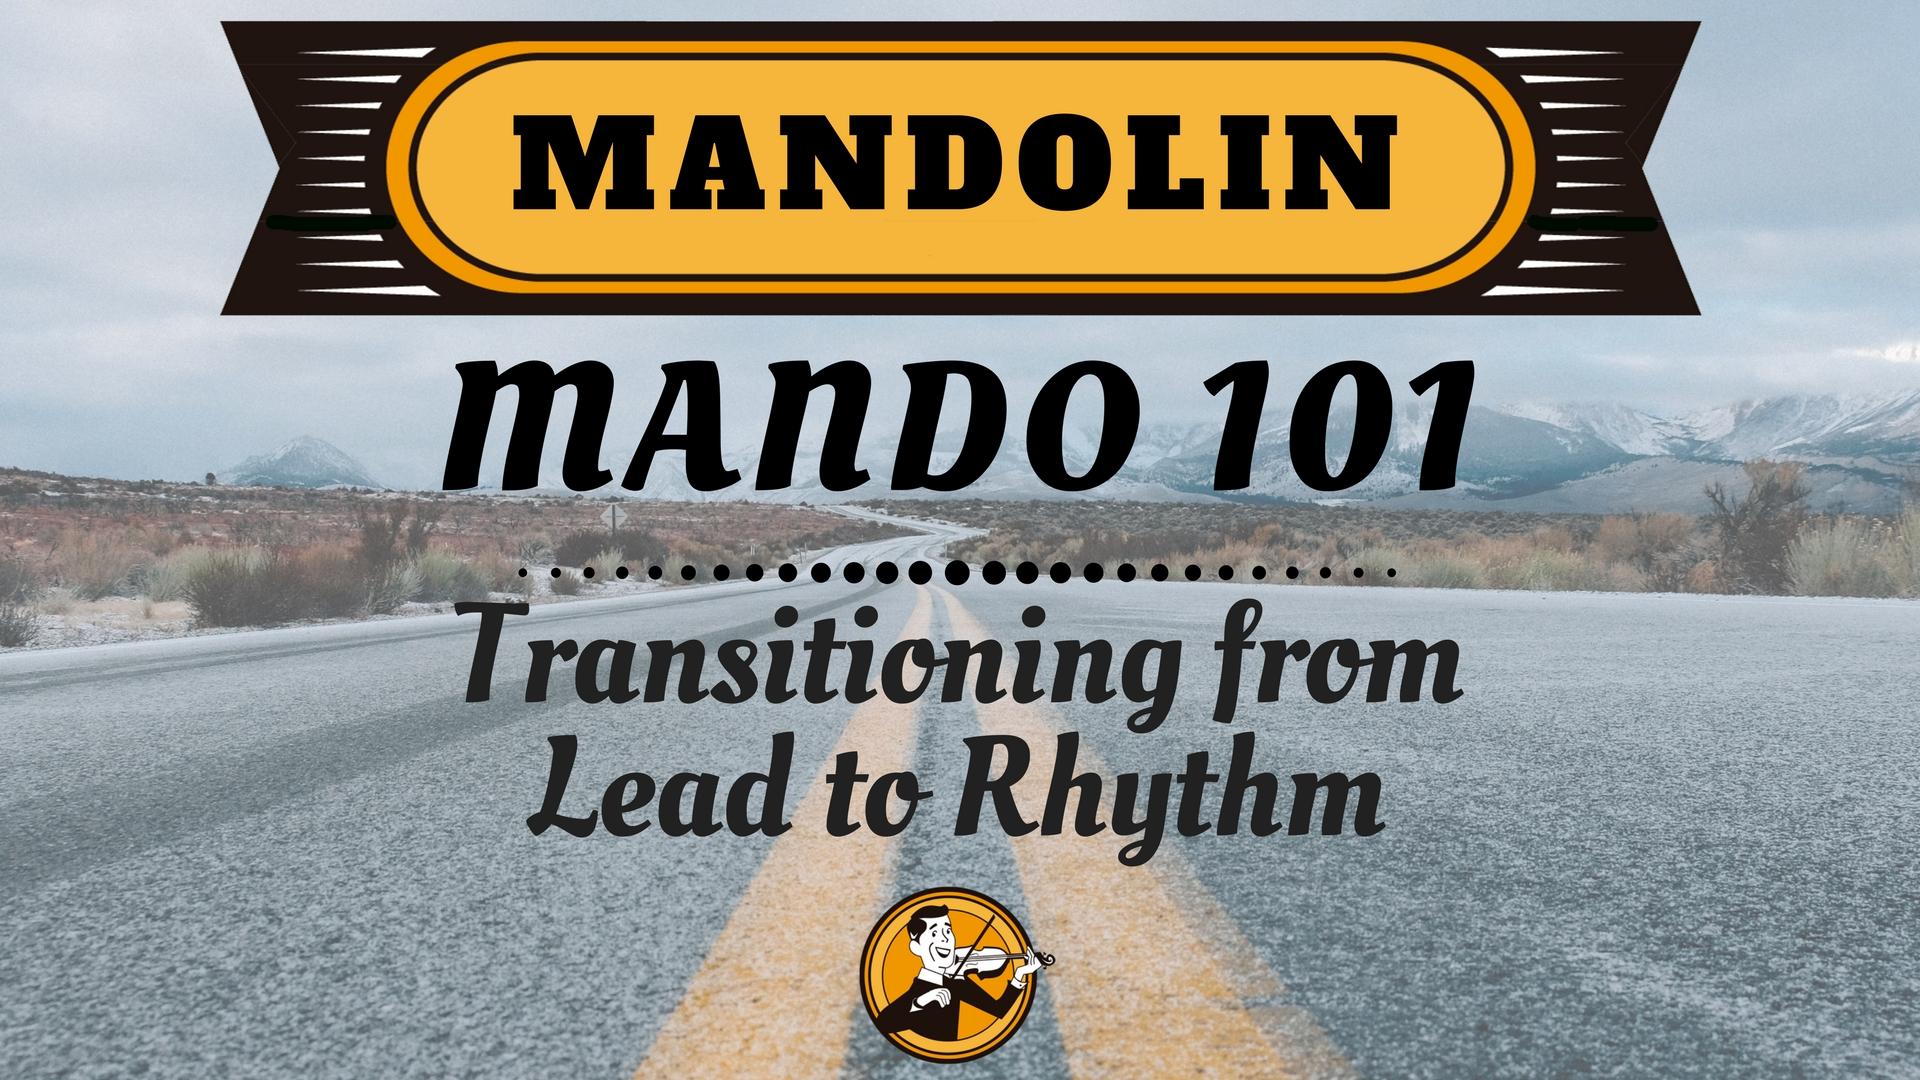 Mando 101 Transitioning from Lead to Rhythm (1)